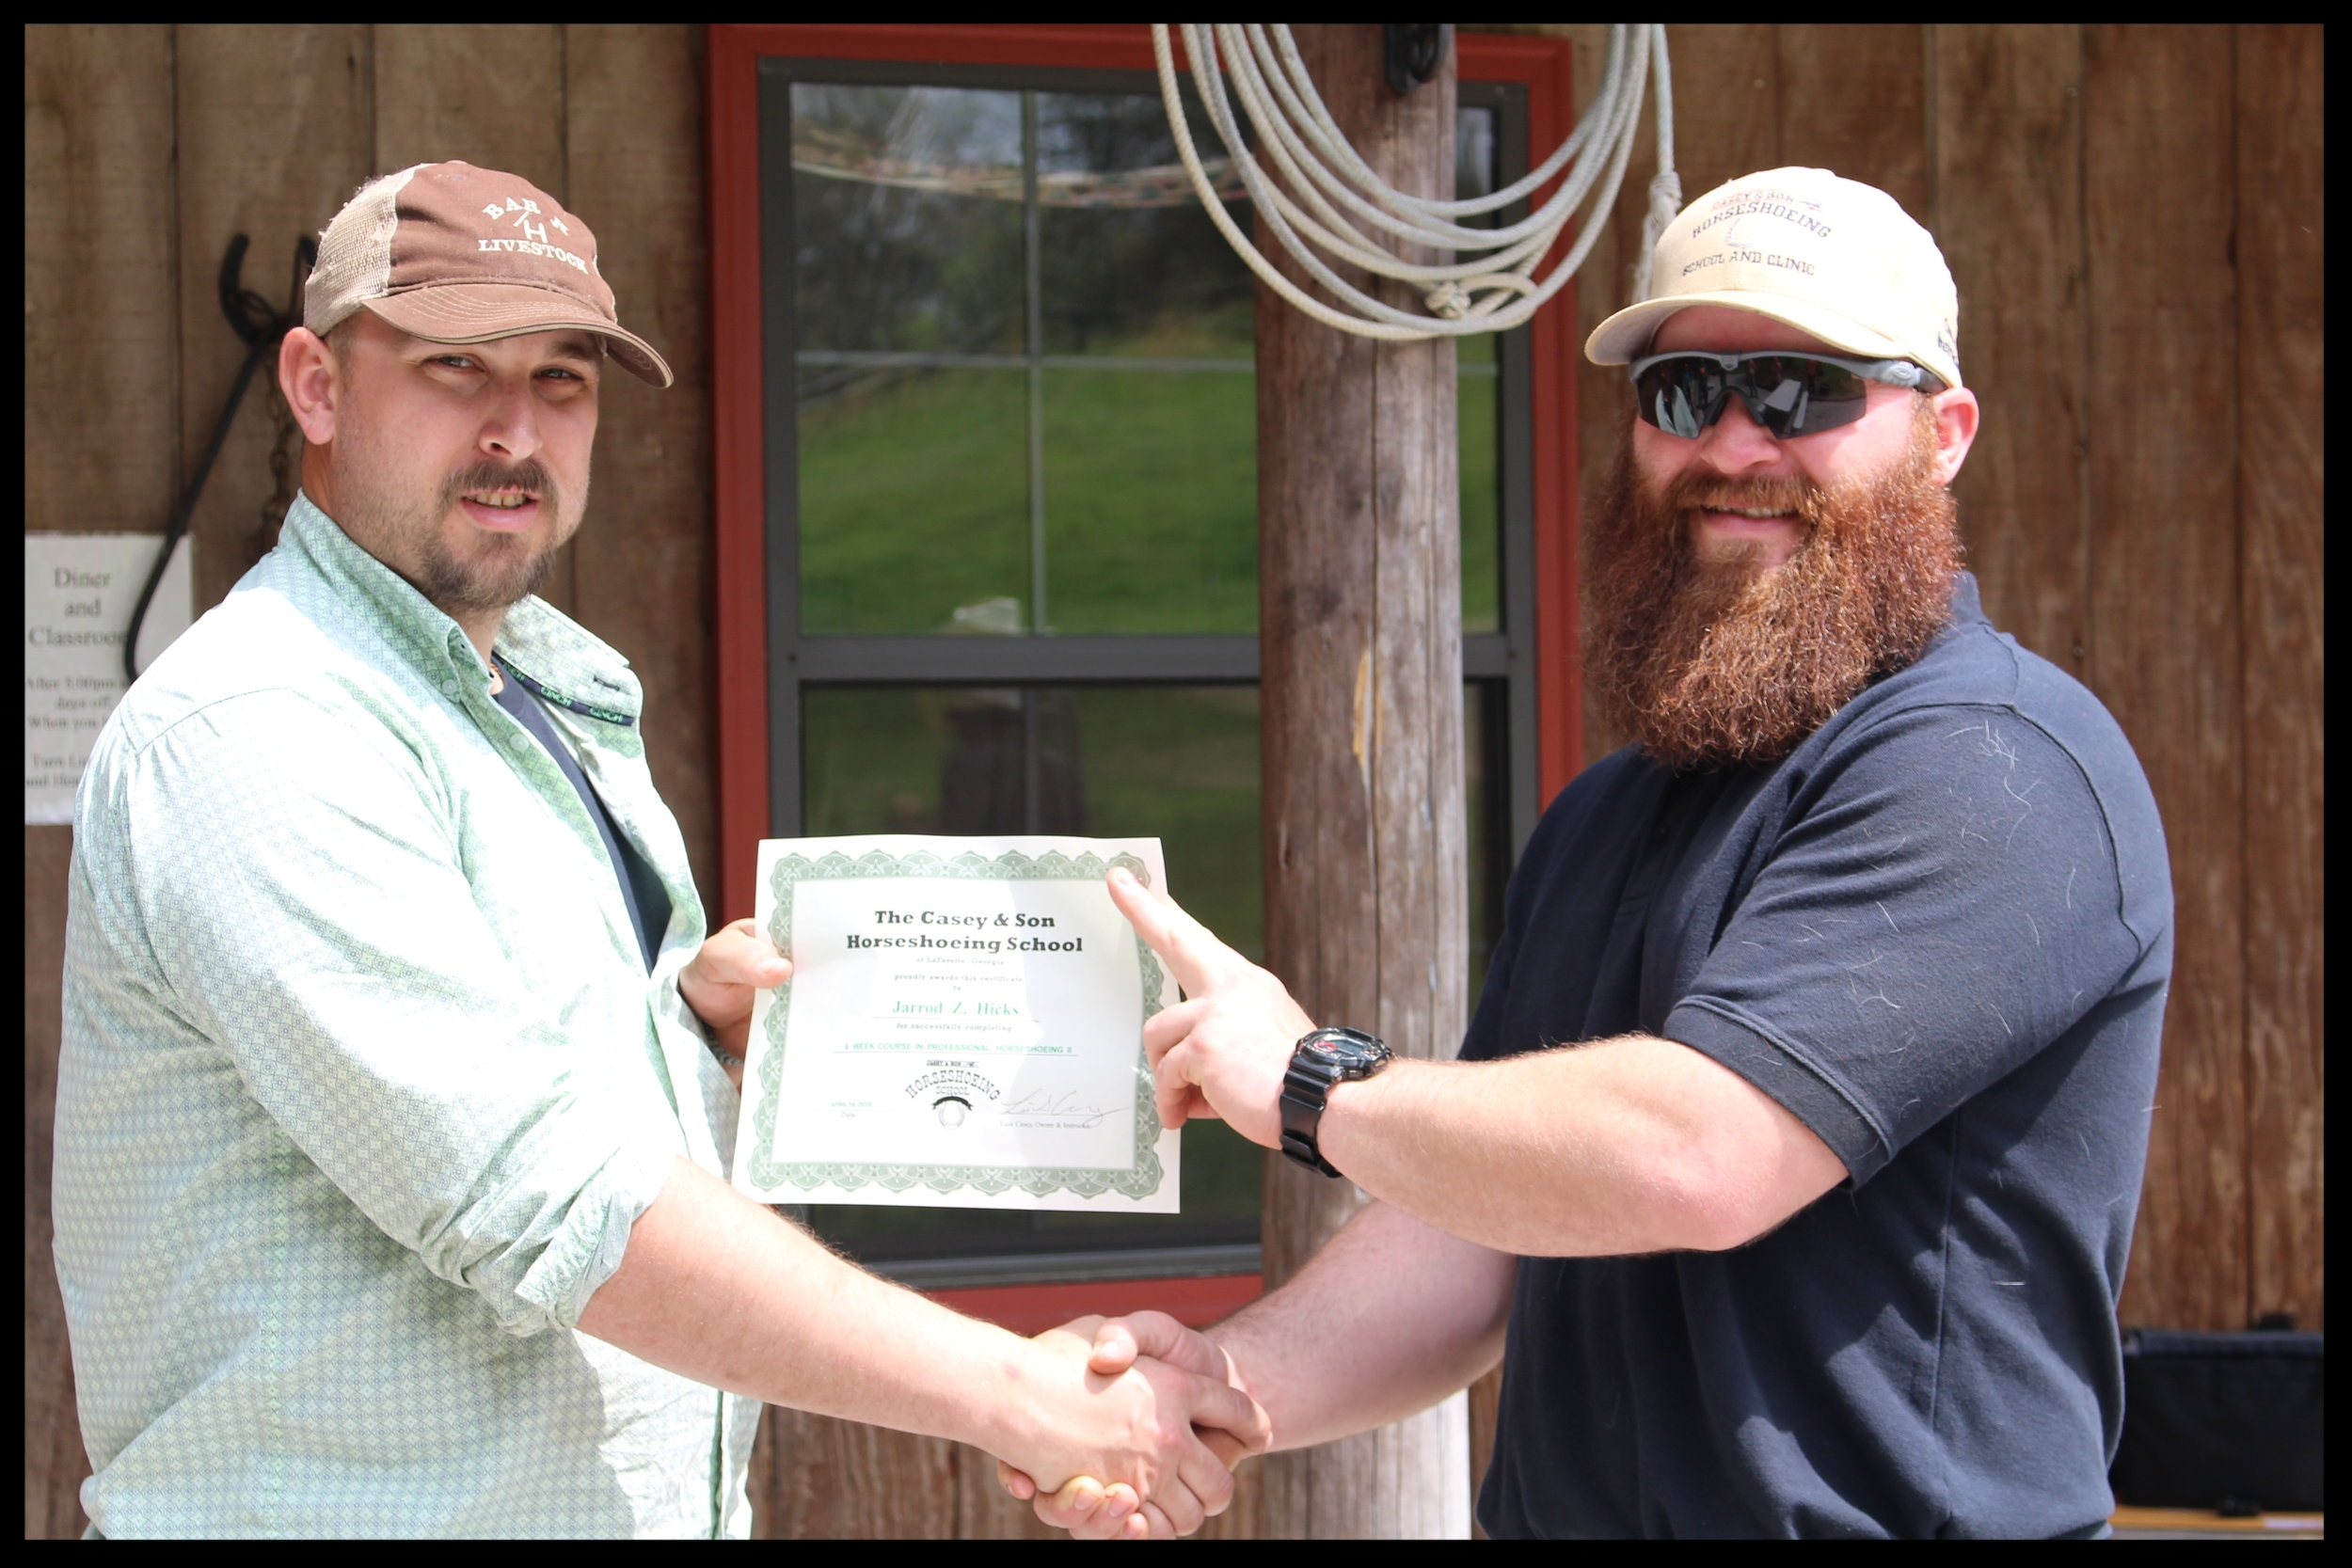 Jarrod Z. Hicks of Virginia, graduate of Casey Horseshoeing School in Georgia  with Link Casey. 4.14.2018.JPG